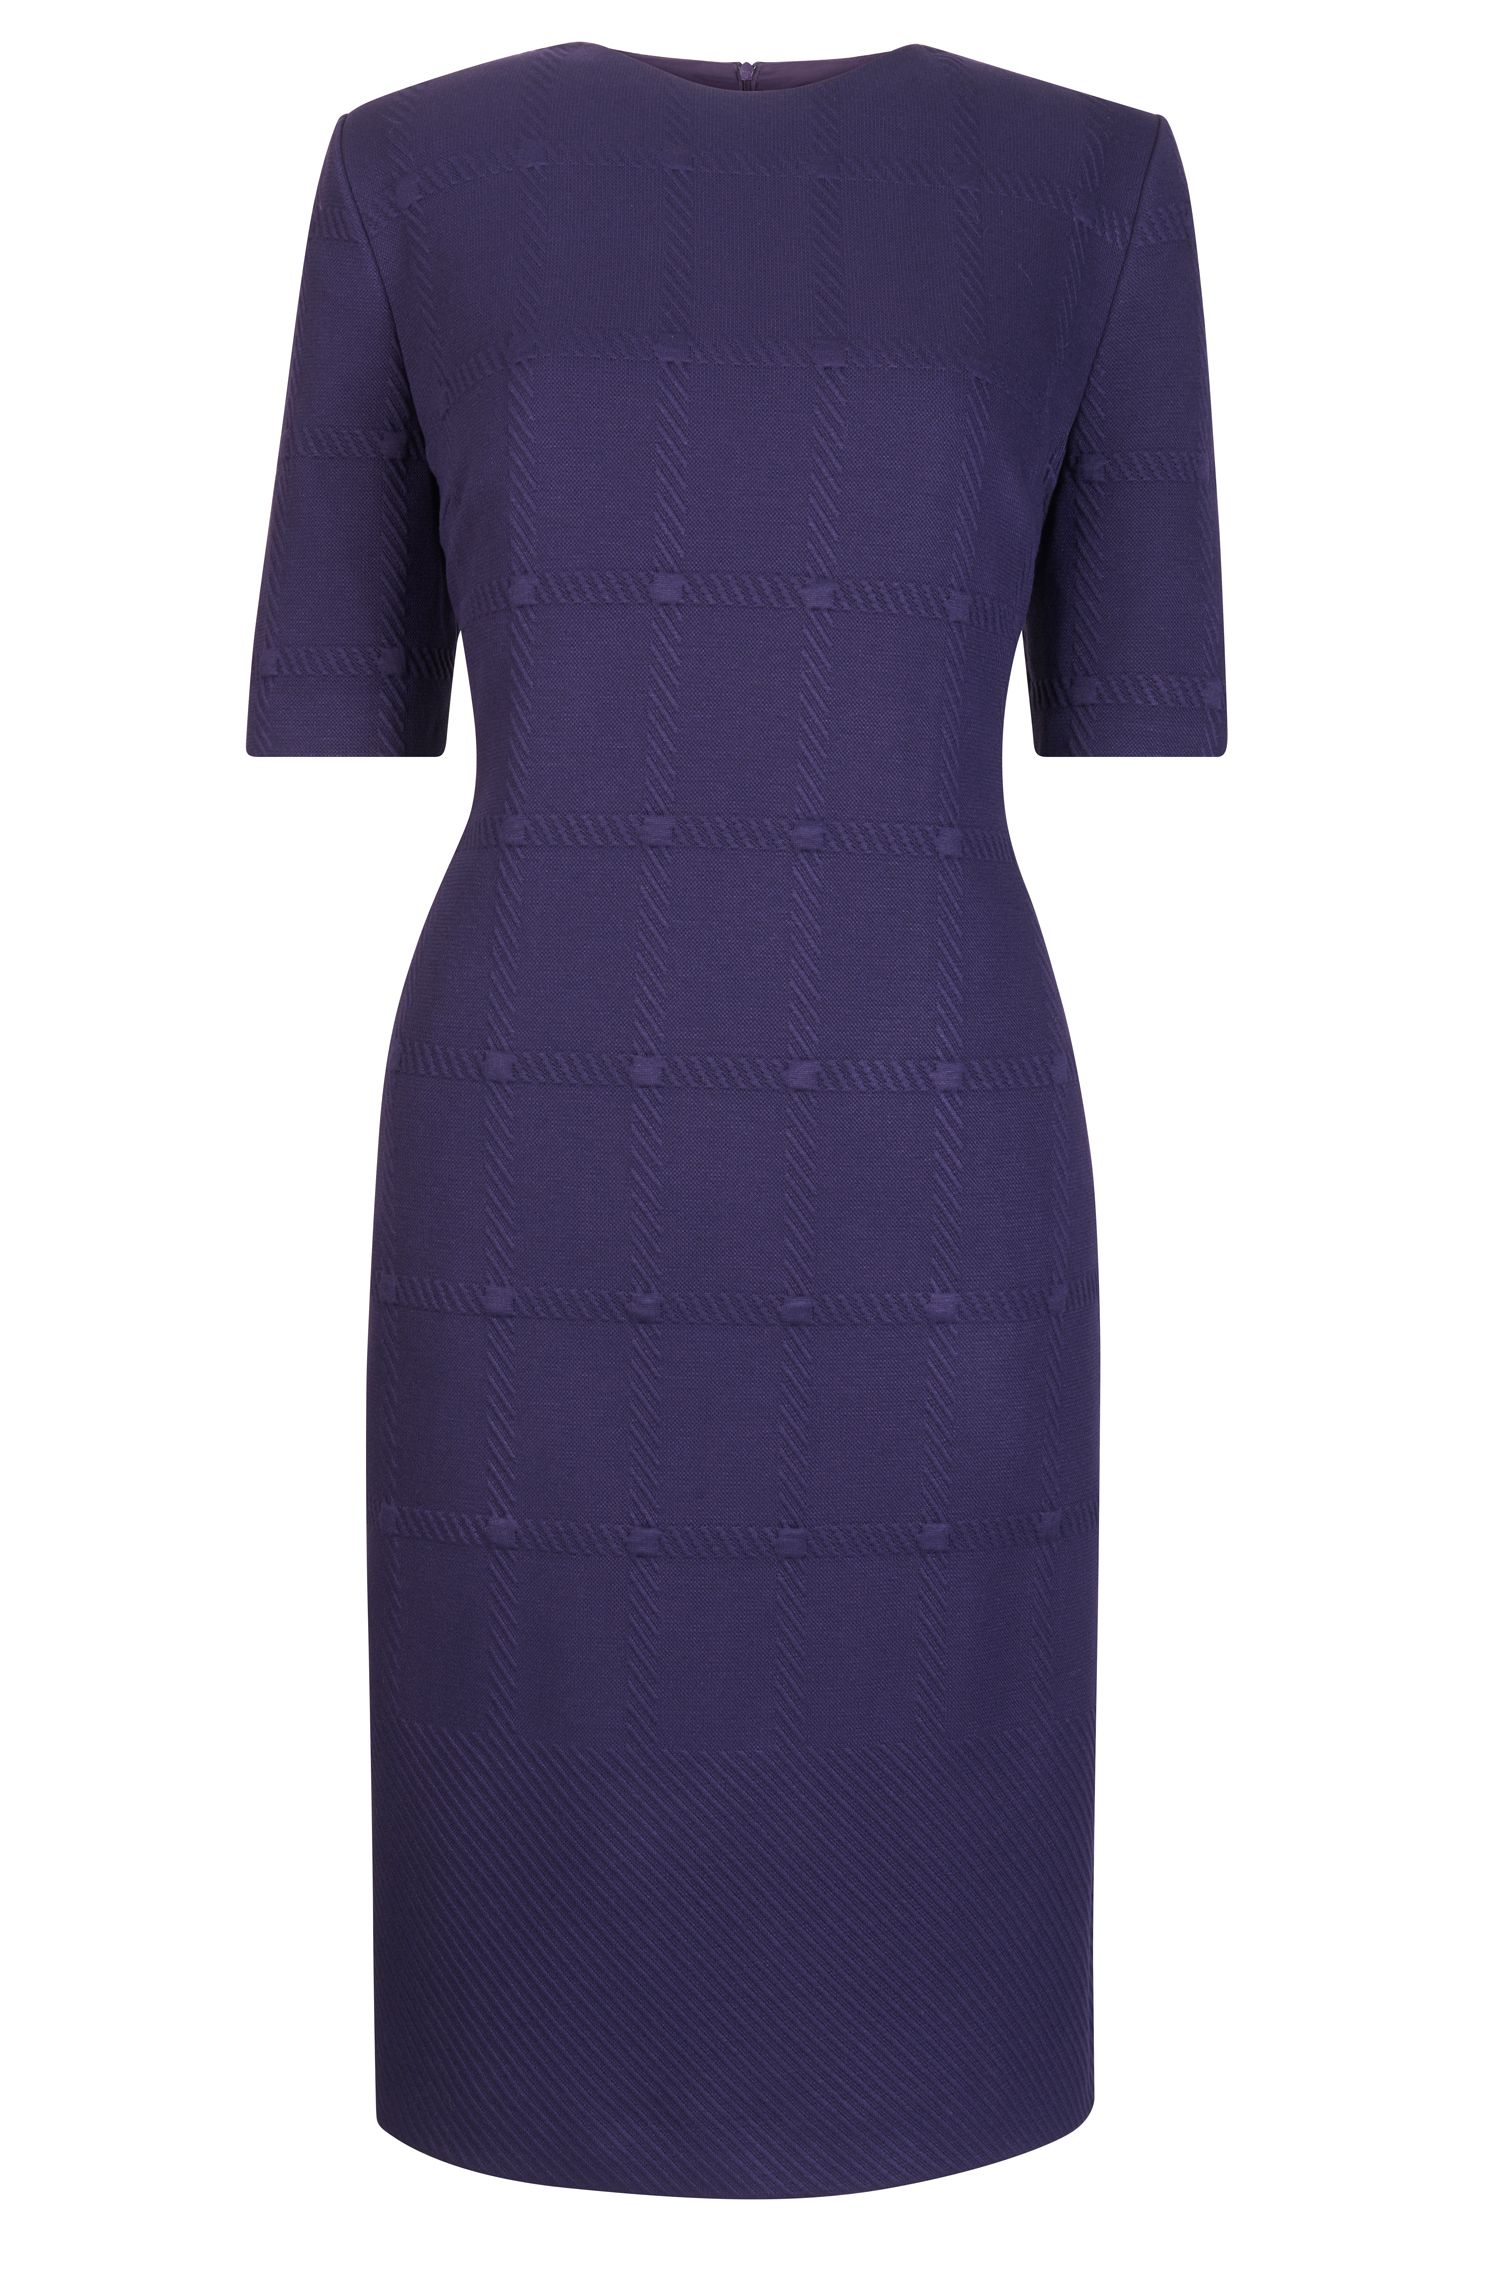 Tonal Check Stretch Sheath Dresss | Hanelli